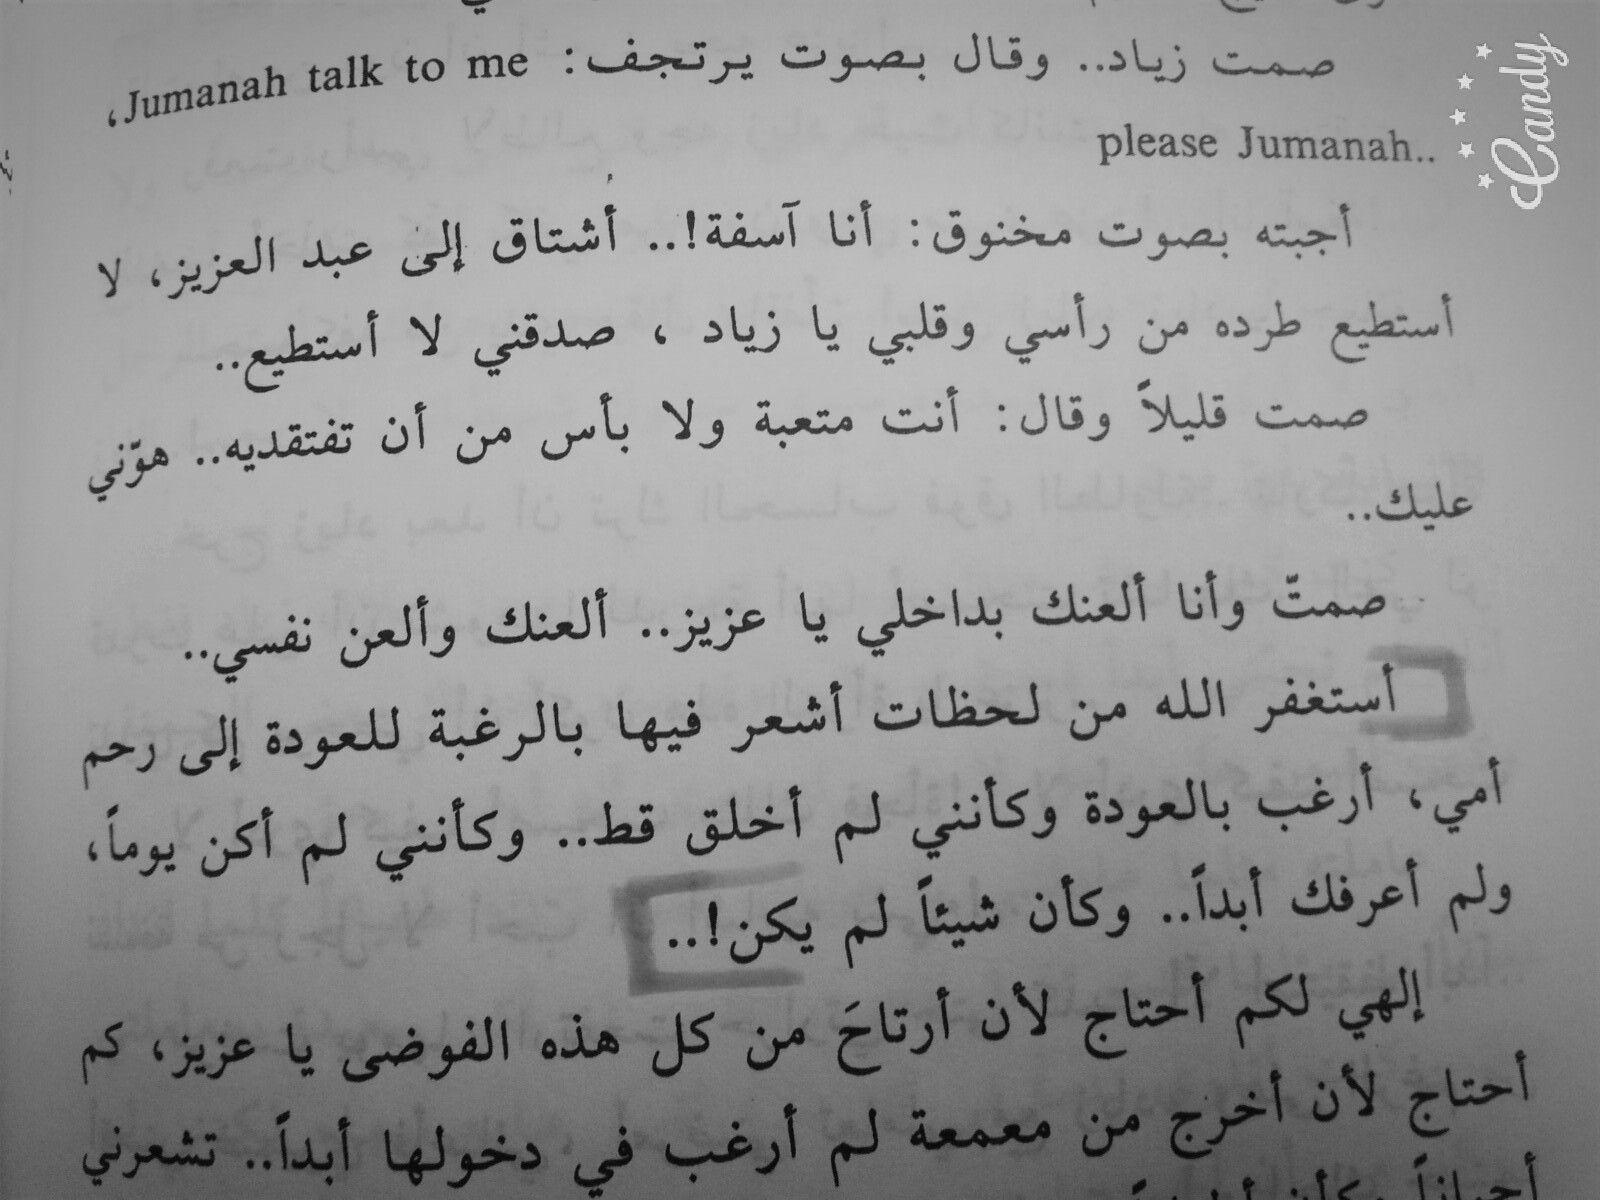 احببتك اكثر مما ينبغي Arabic Quotes Quotations Arabic Words